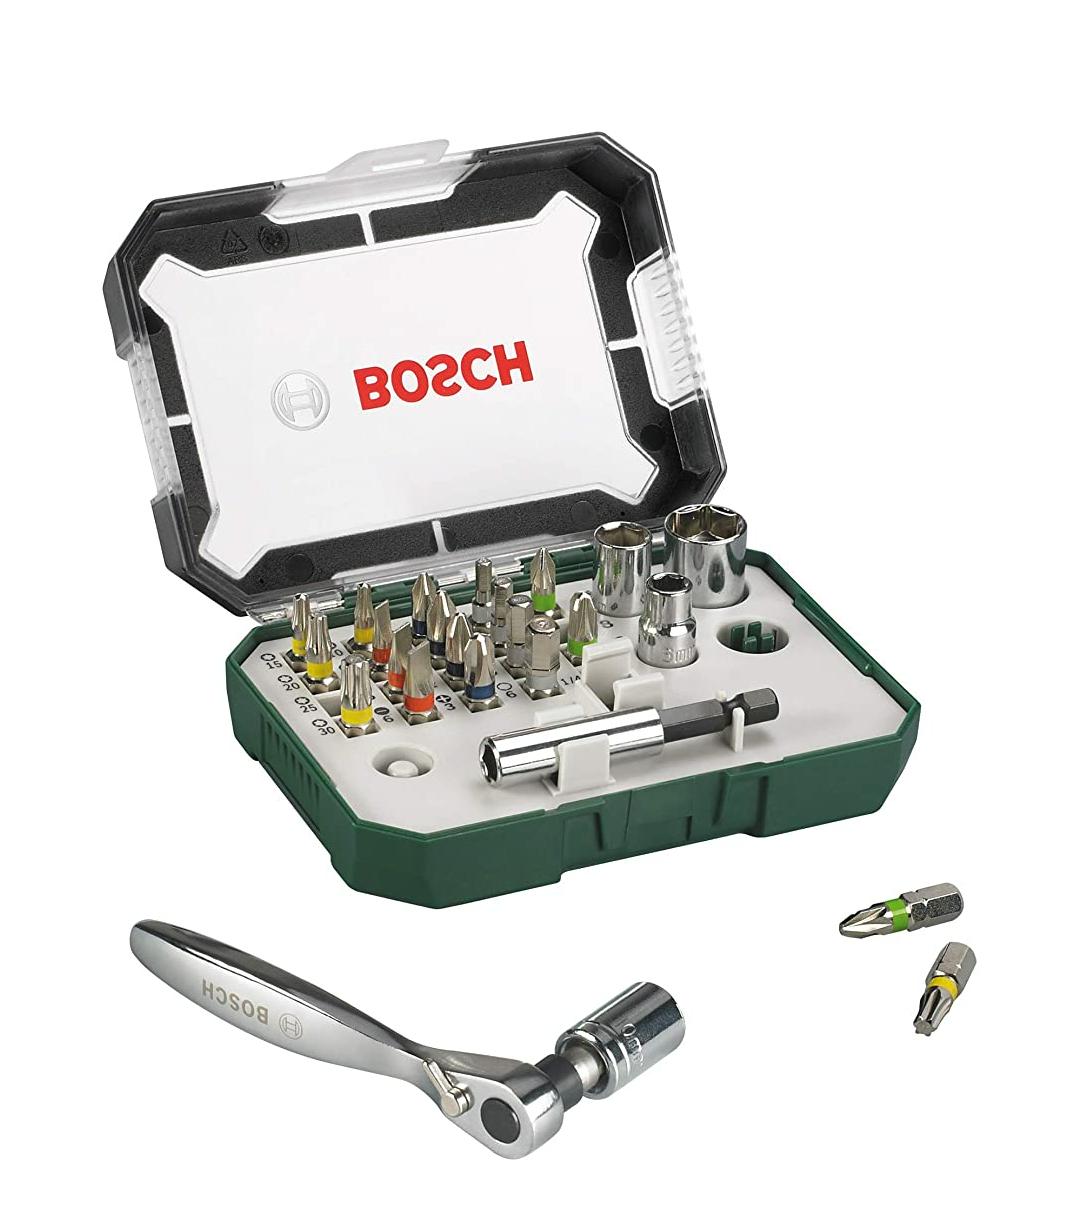 Set Bosch Herramientas Mini 26 piezas